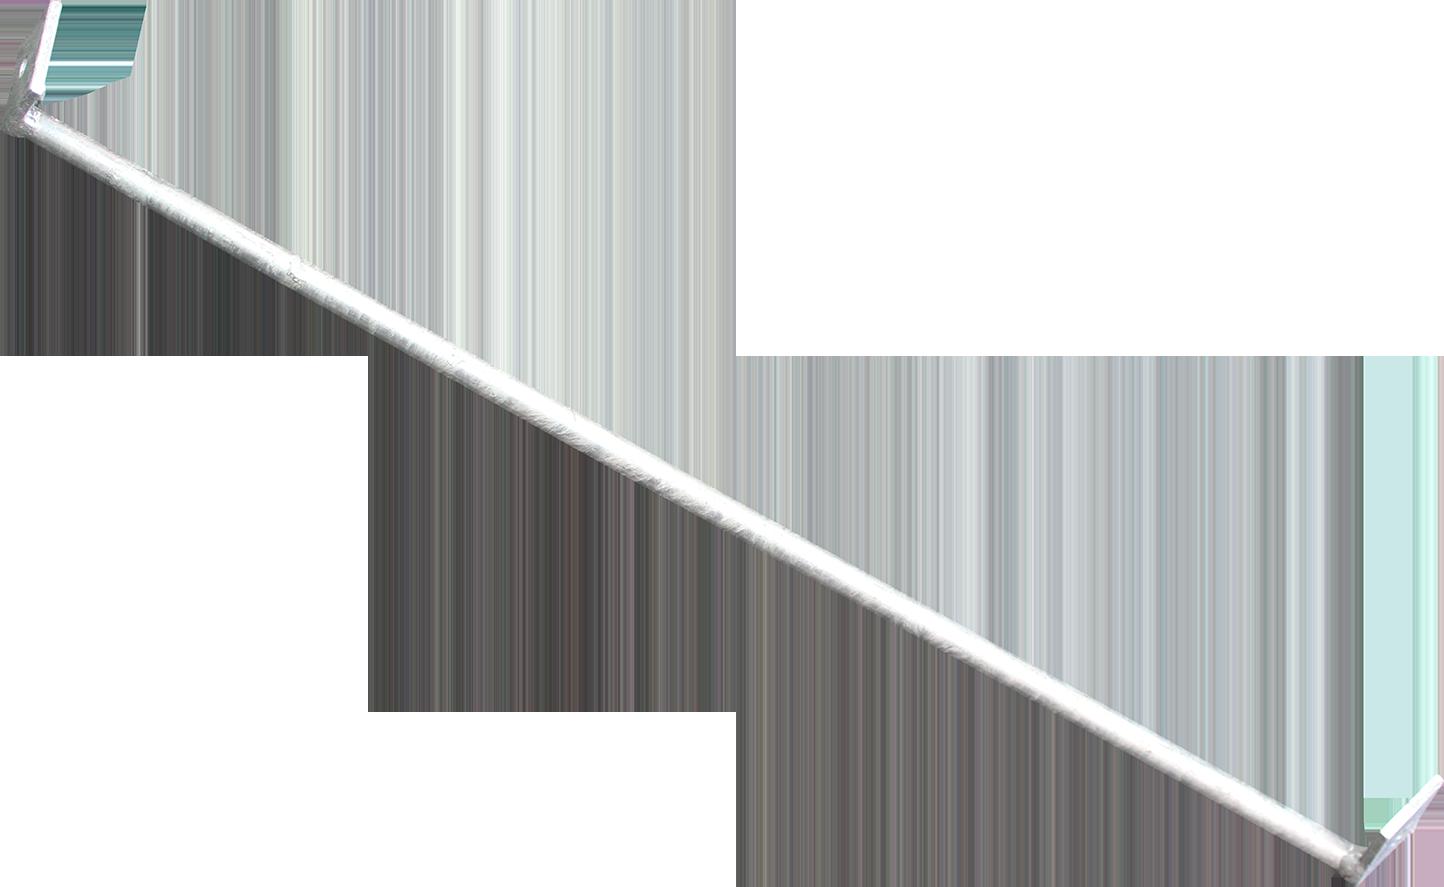 SP100-043